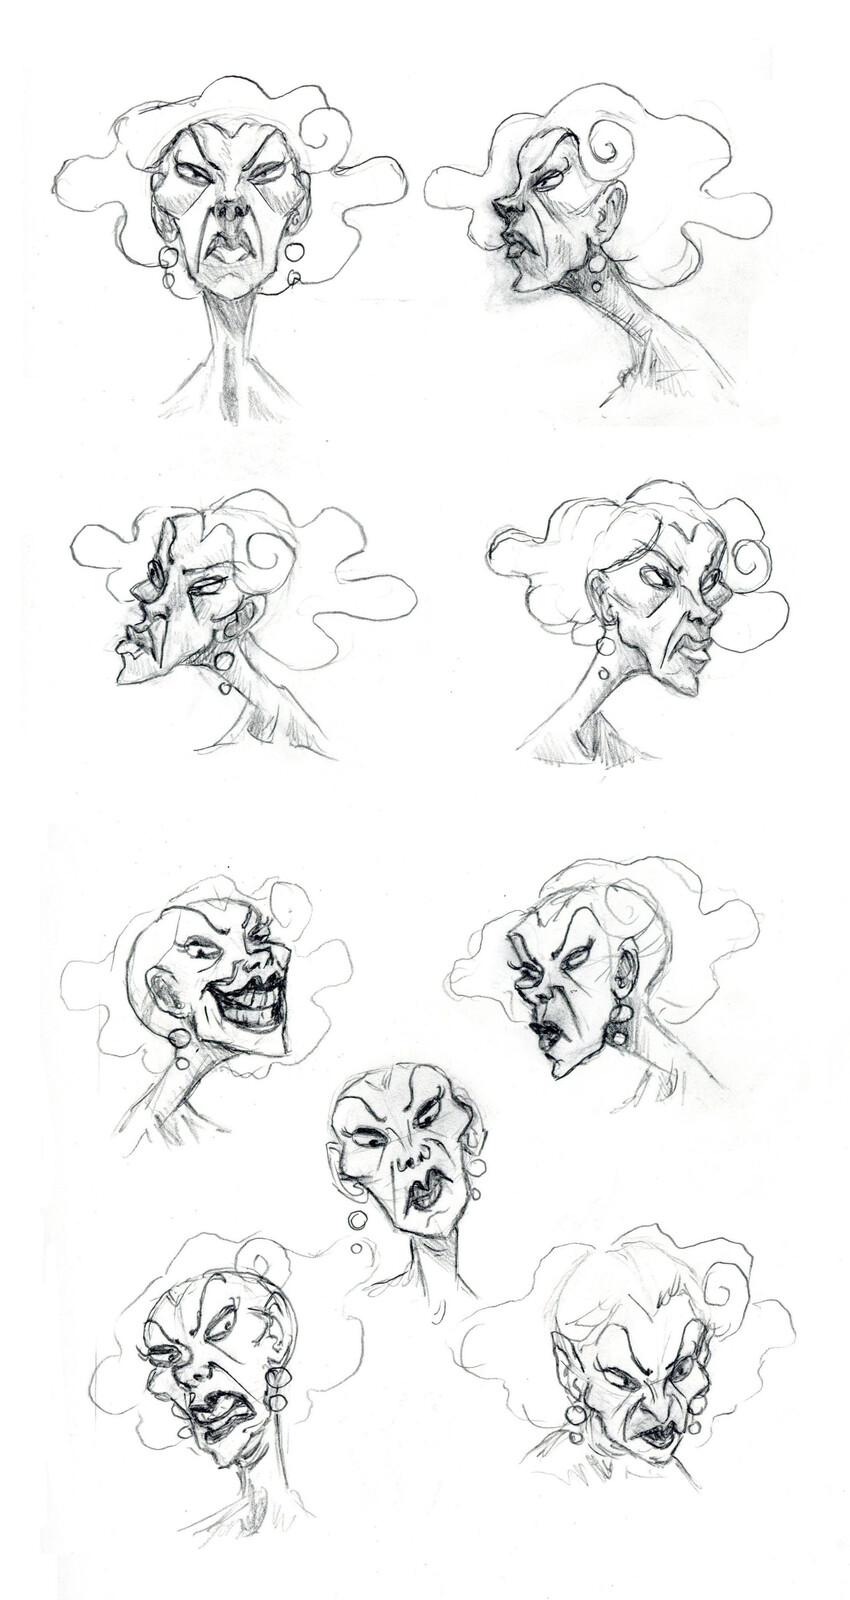 Veronique expression sheet.